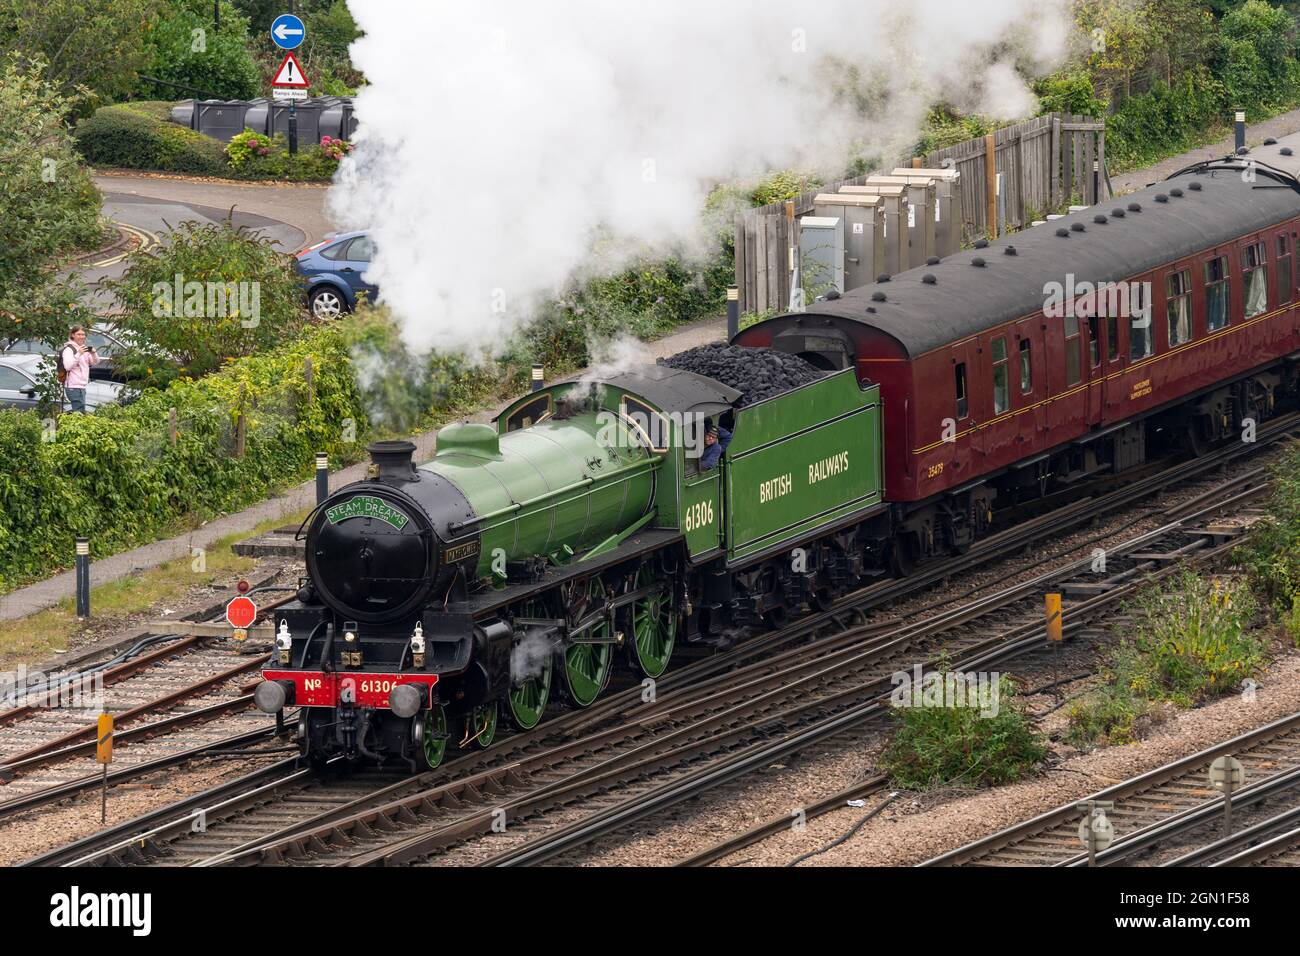 the-mayflower-61306-b1-steam-locomotive-